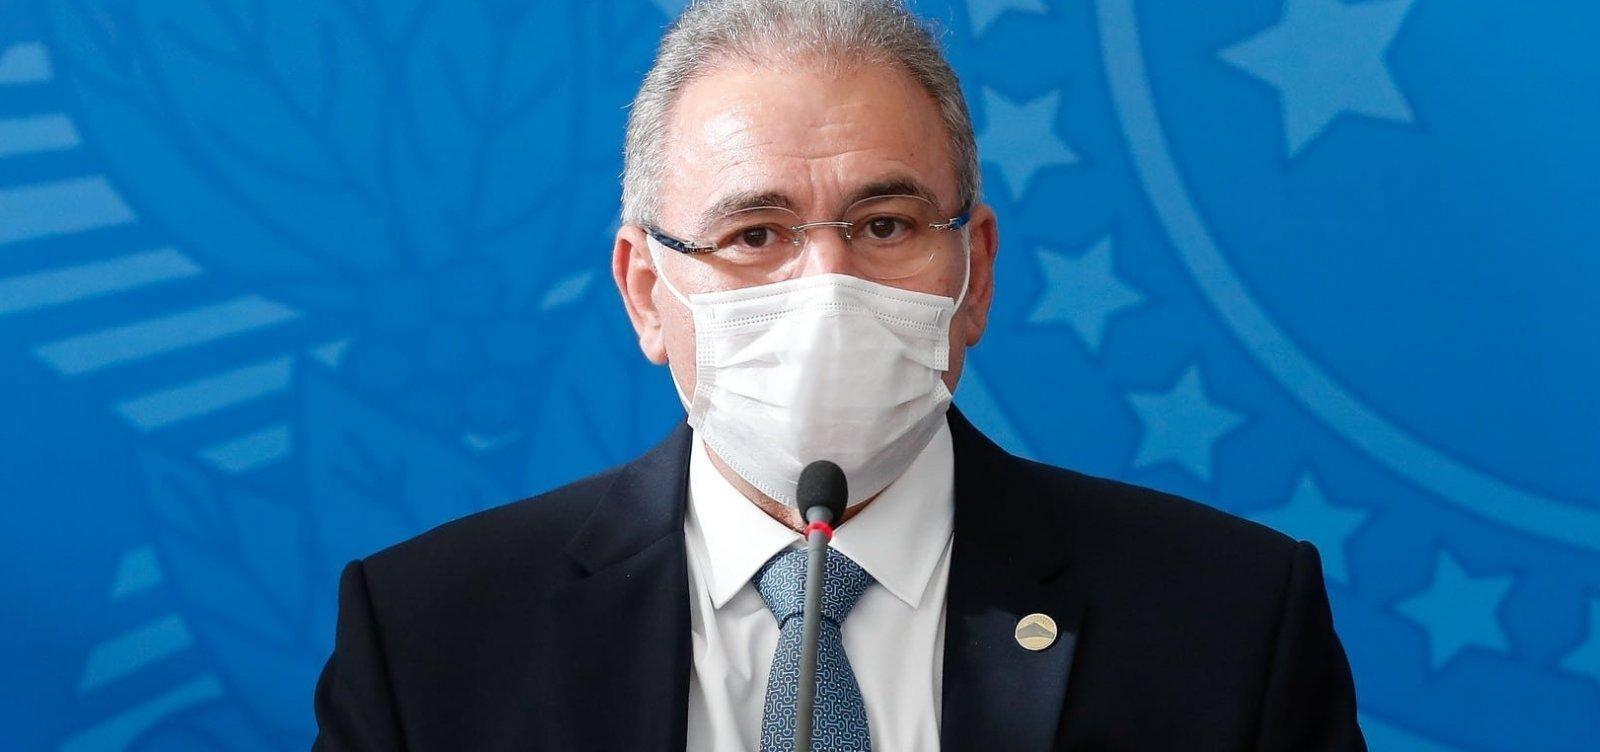 Ministro da Saúde pede que brasileiros tomem segunda dose contra Covid-19